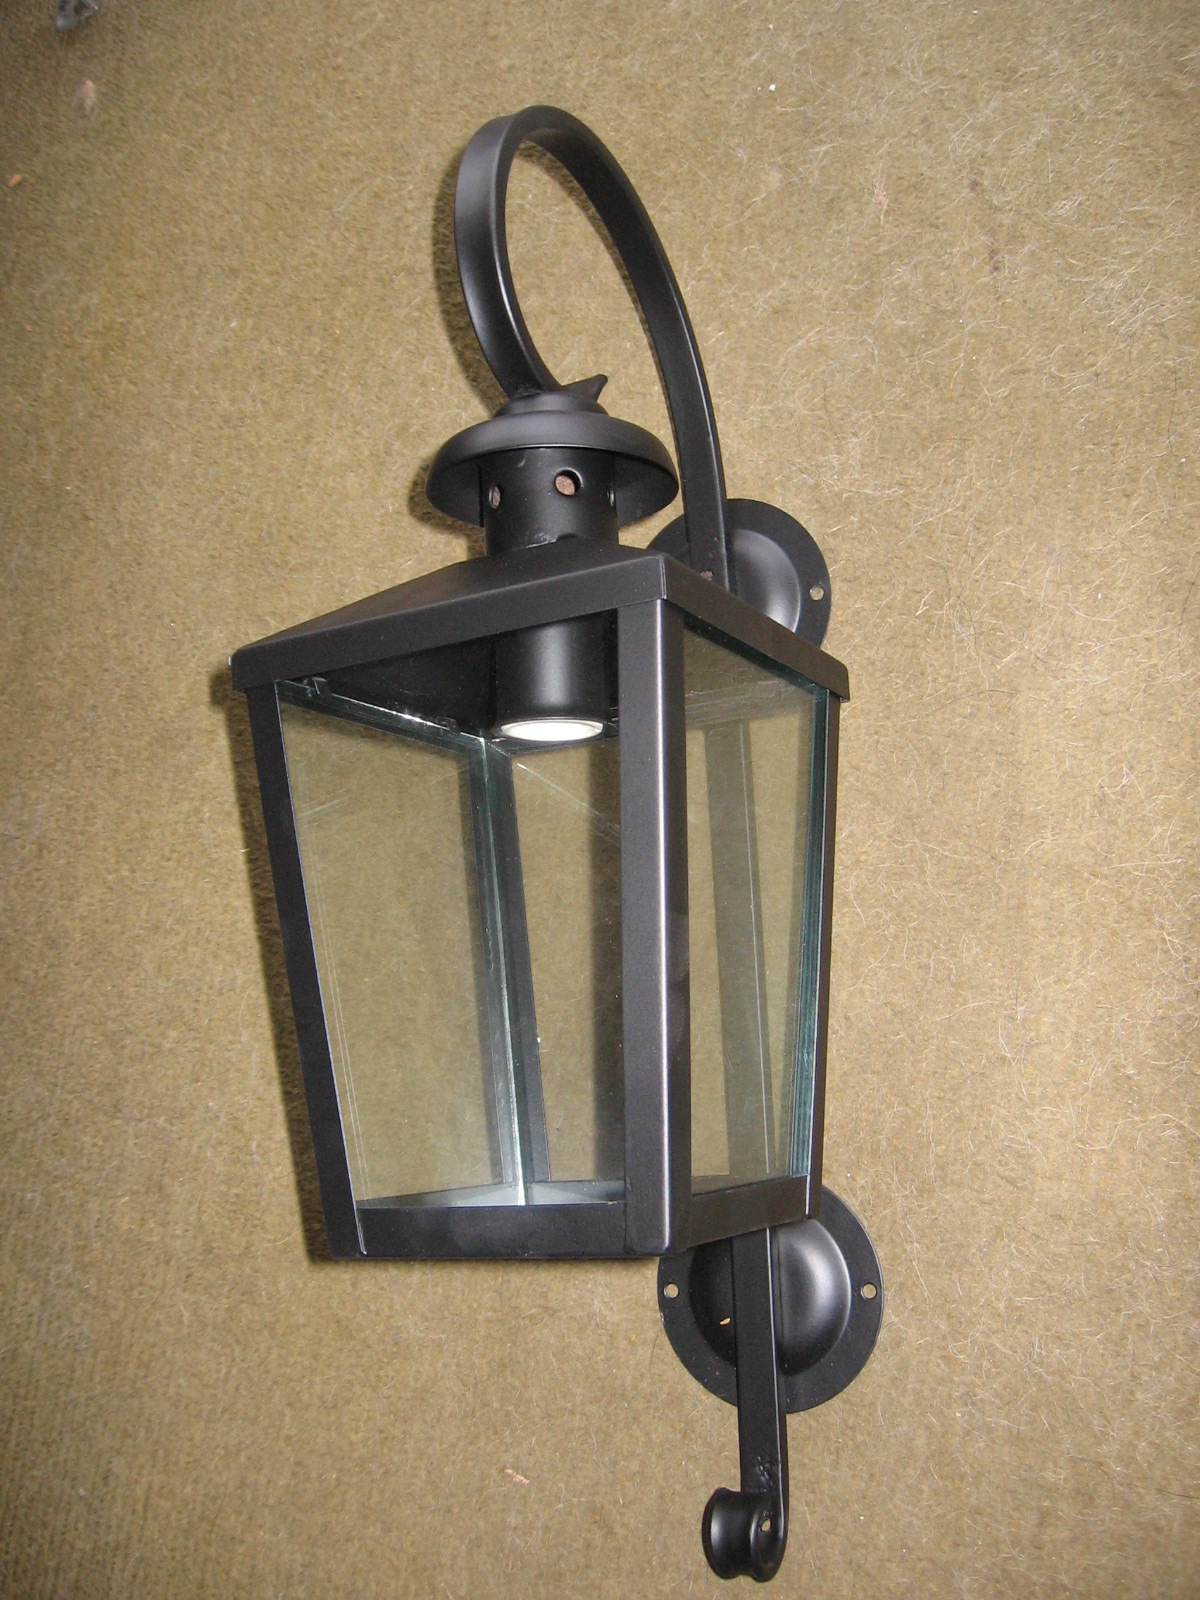 Outlet iluminacion interior ofertas outlet exterior for Outlet muebles exterior